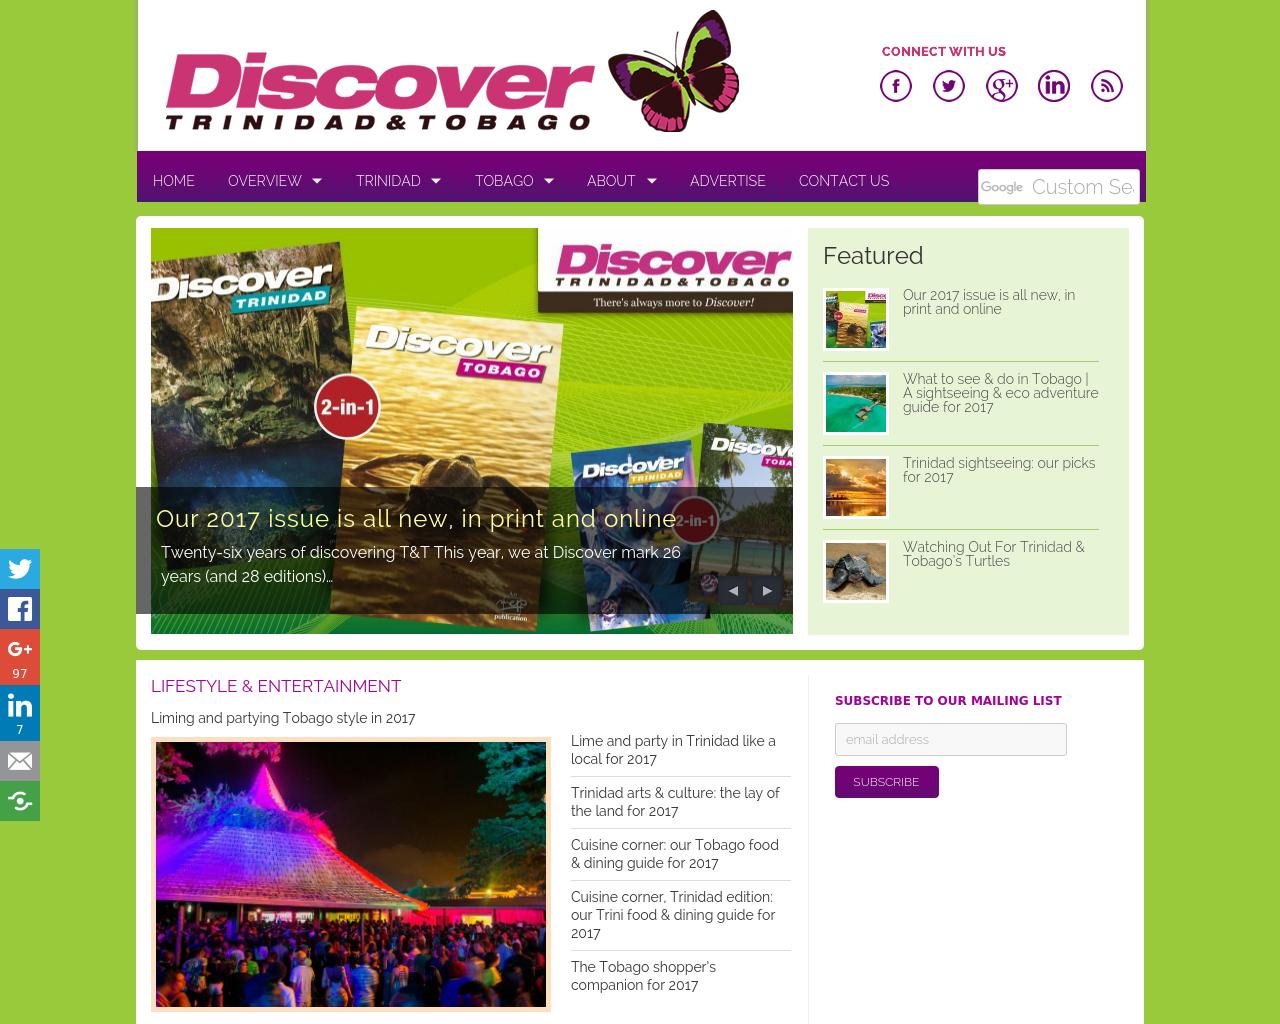 Discover-Trinidad-And-Tobago-Advertising-Reviews-Pricing